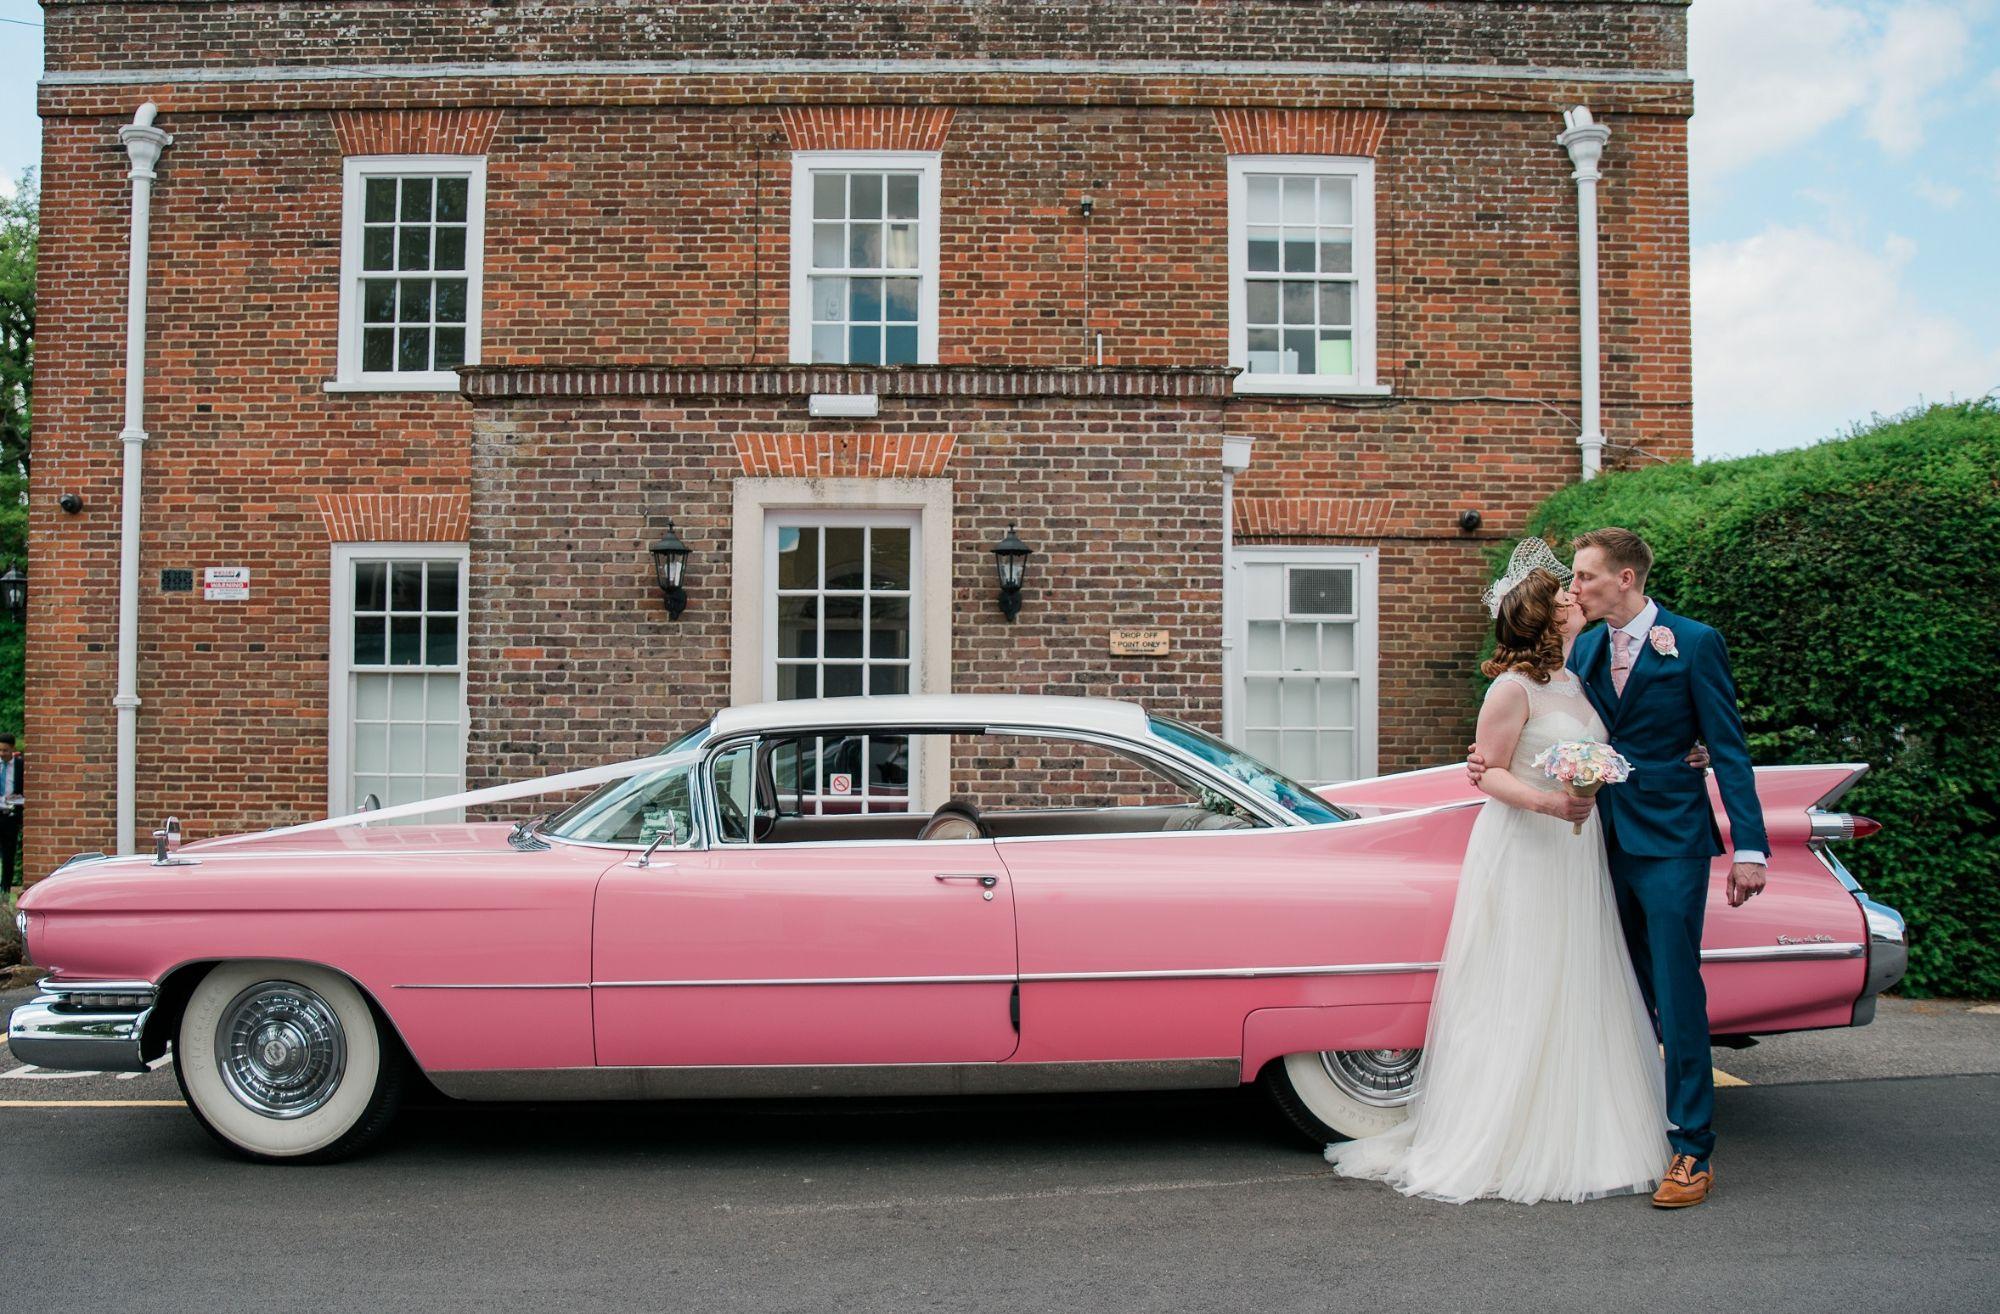 AH Wedding - Laura & Harry 6 (small)